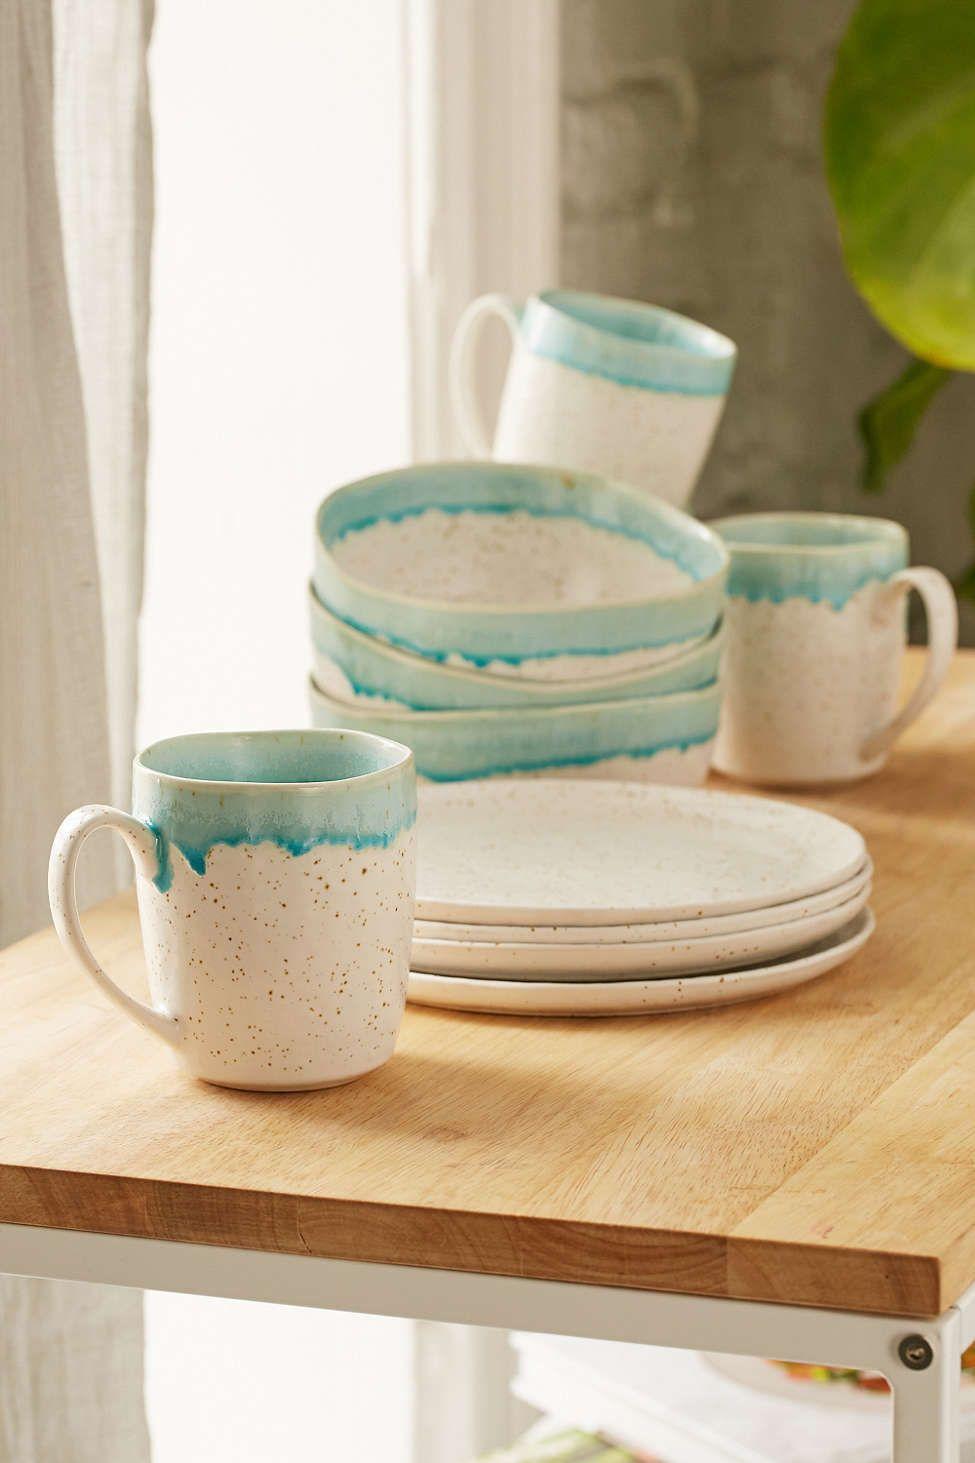 12-Piece Speckle Reactive Glaze Dinnerware Set & 12-Piece Speckle Reactive Glaze Dinnerware Set | Dinnerware Glaze ...